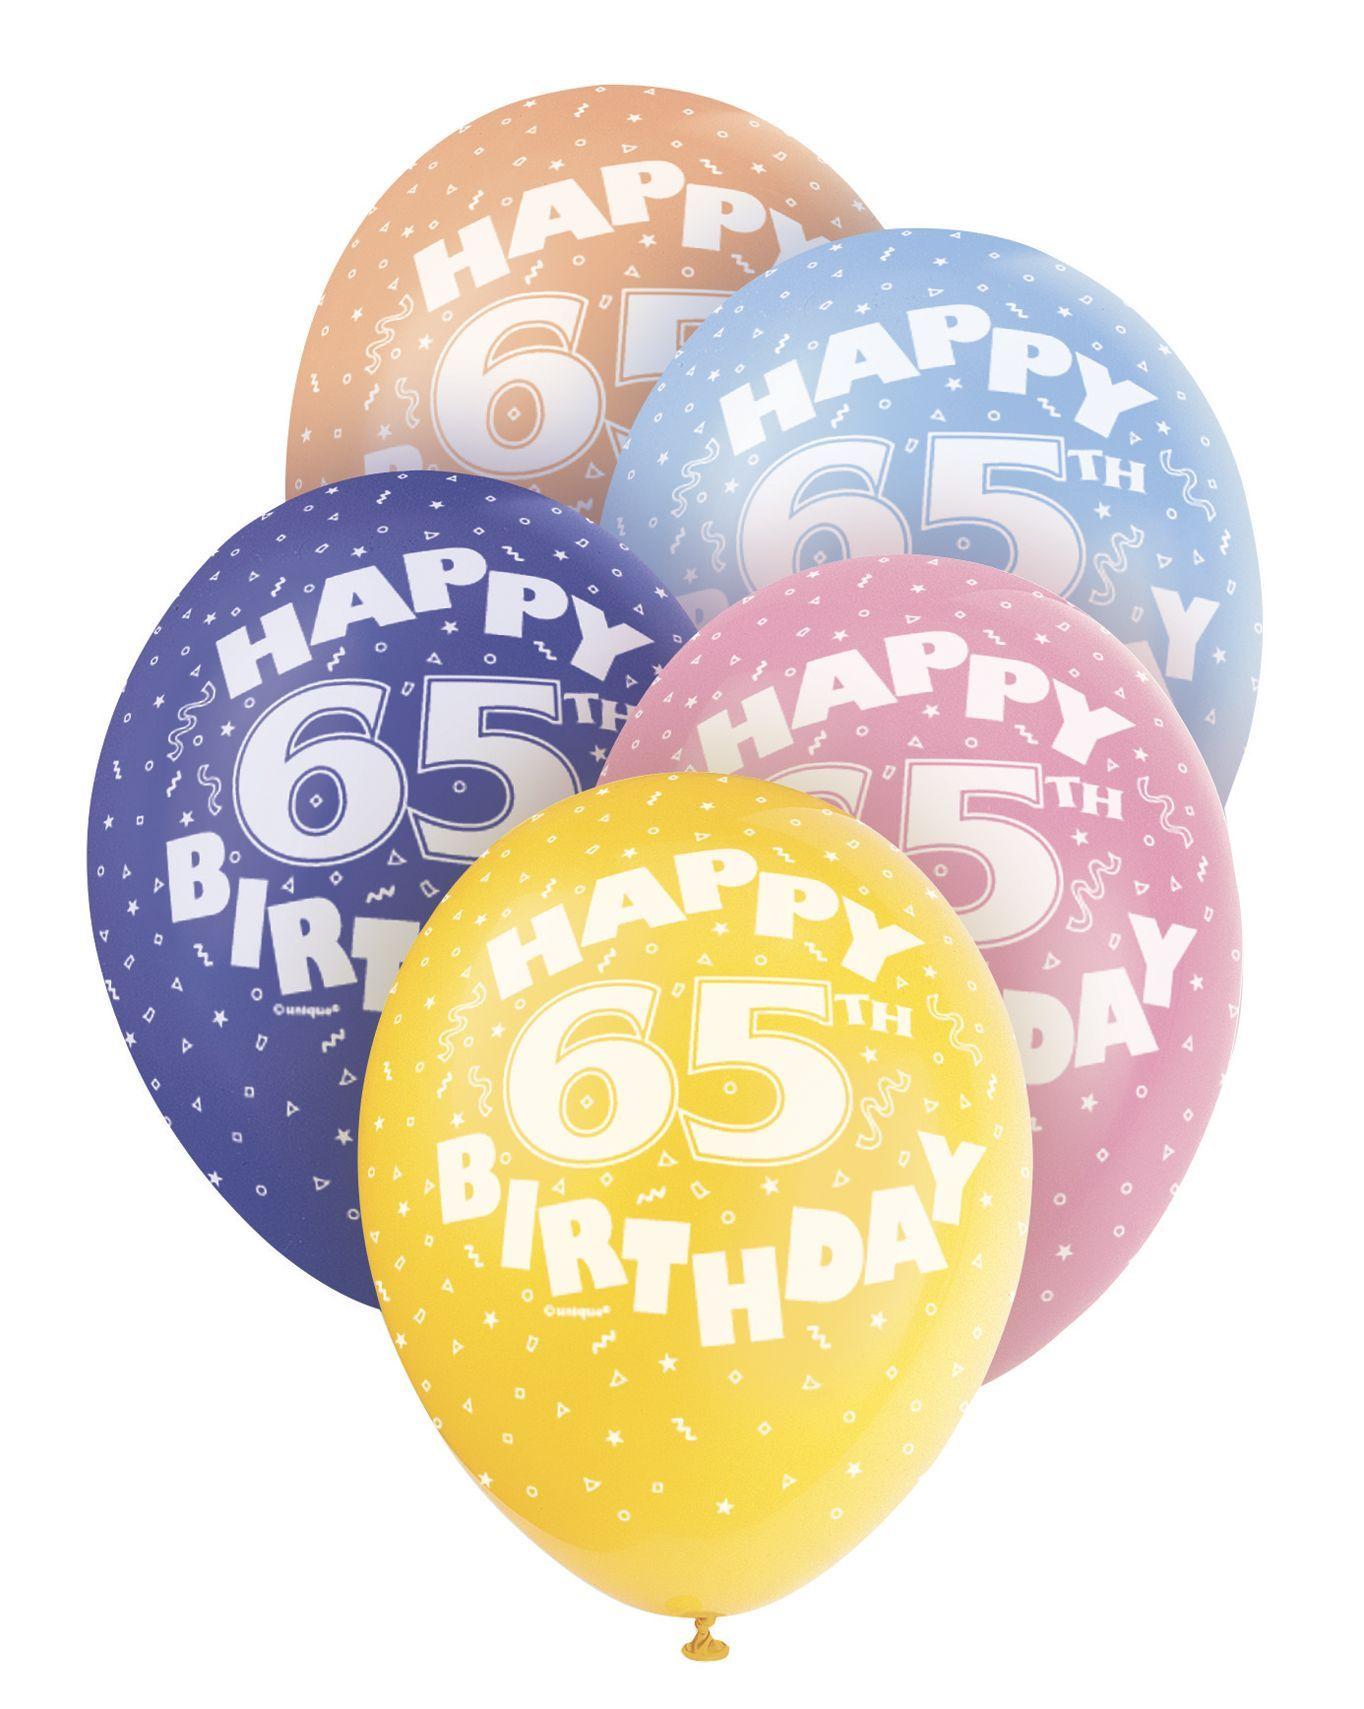 Pearlized Happy 65th Birthday Balloons 5 X 12 Colours May Vary